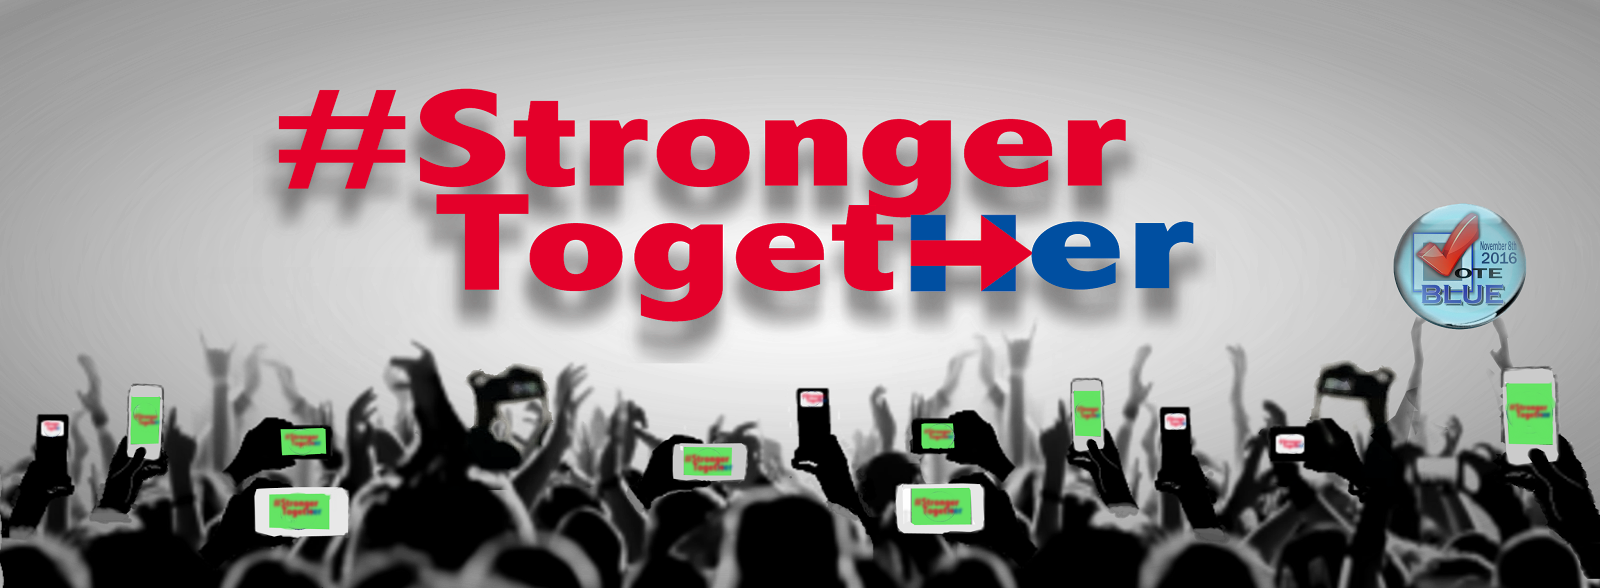 #StrongerTogether